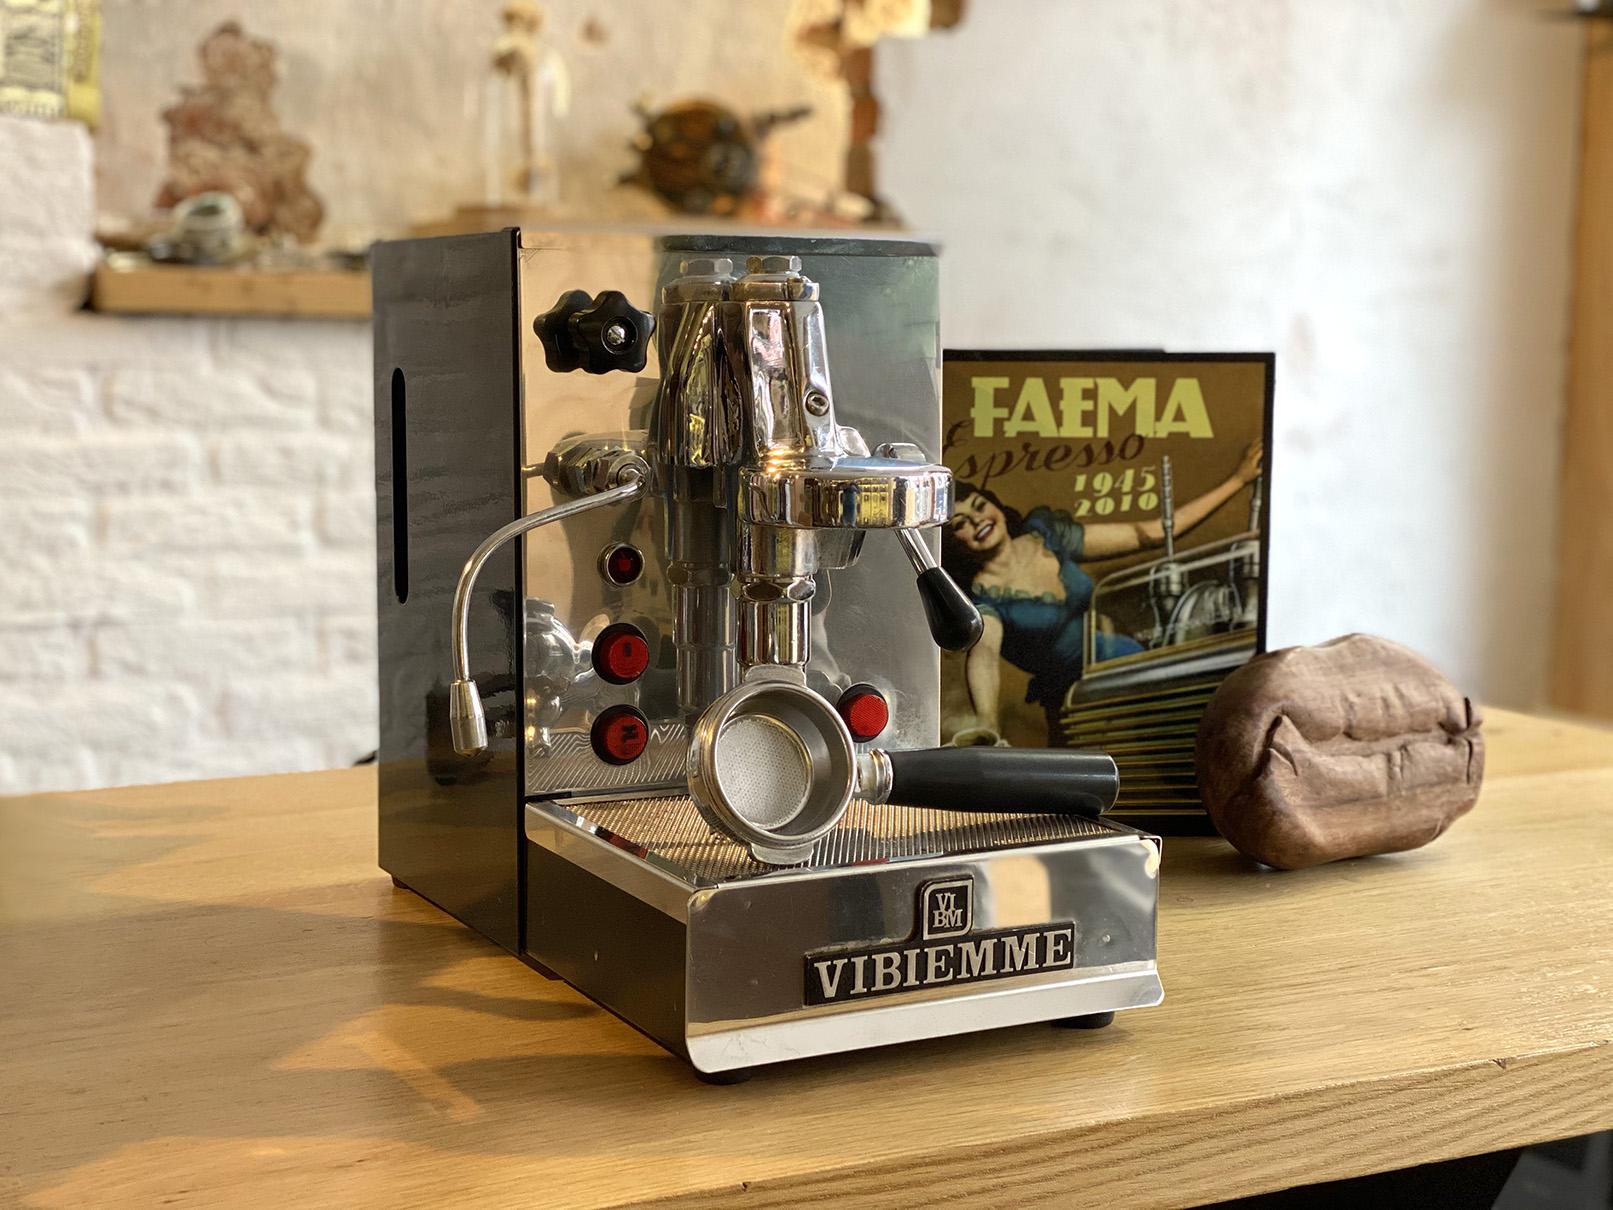 Vintage espressomachine